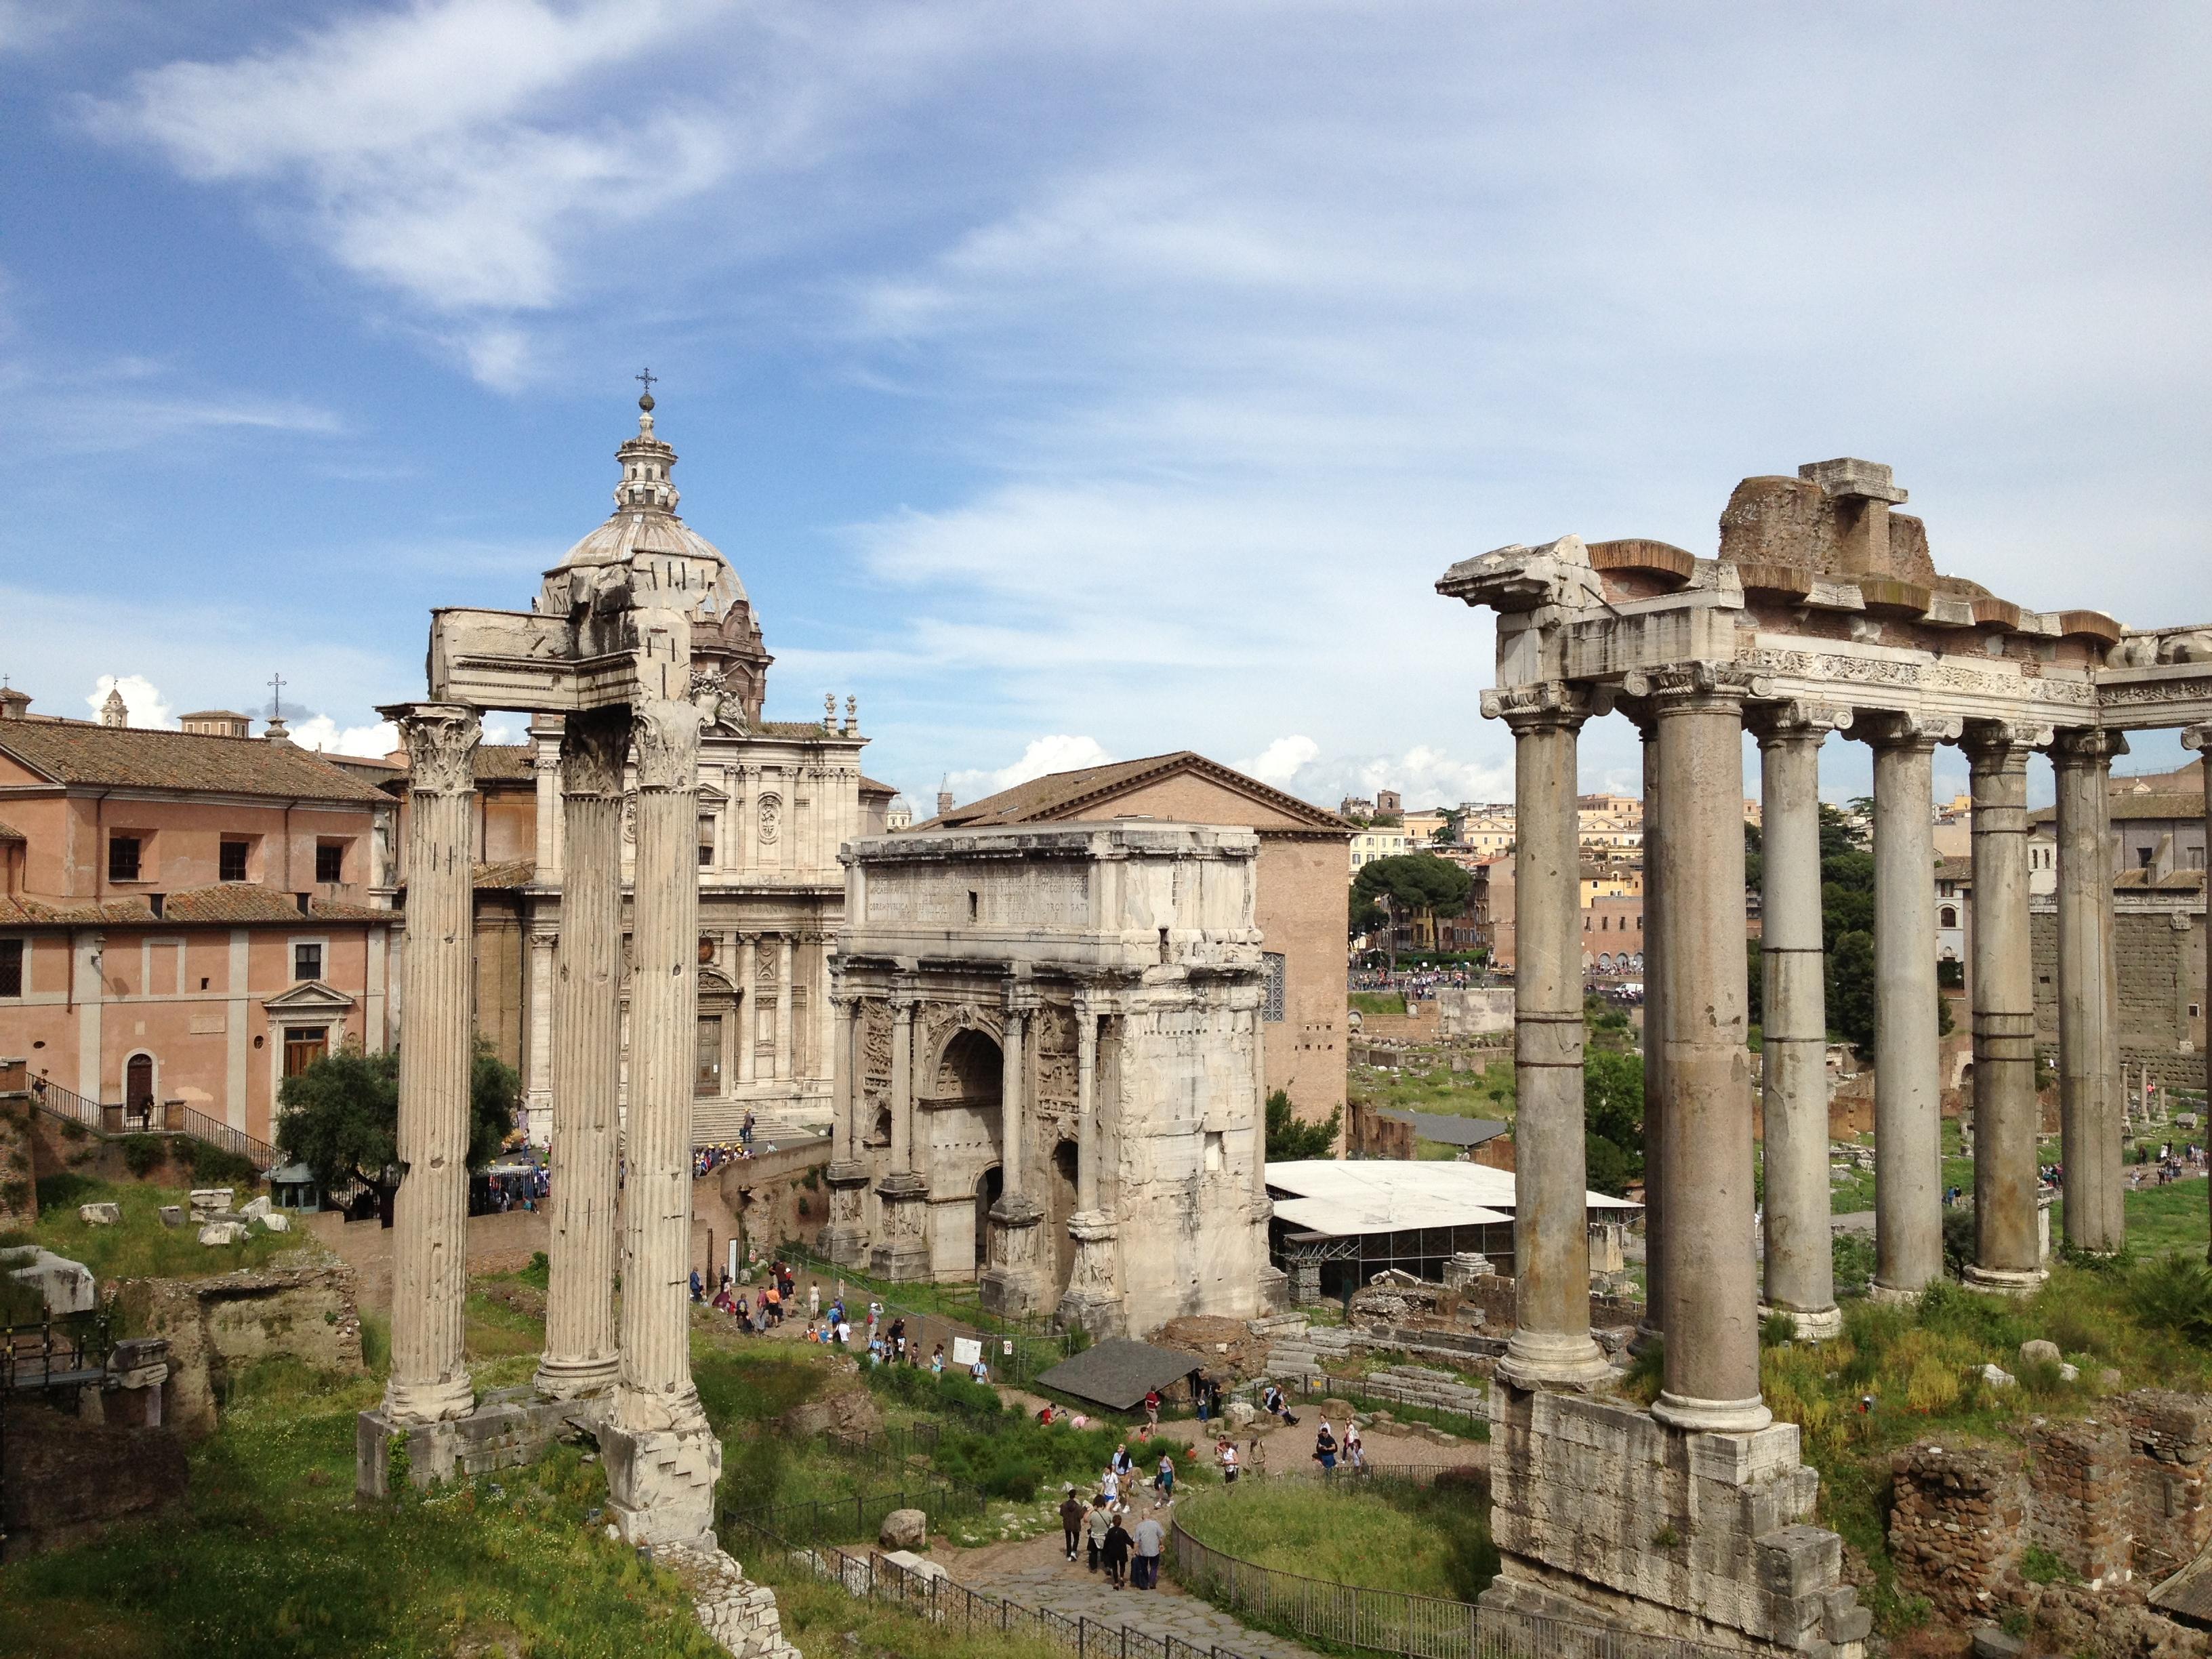 Colosseum, Rome, Vatican